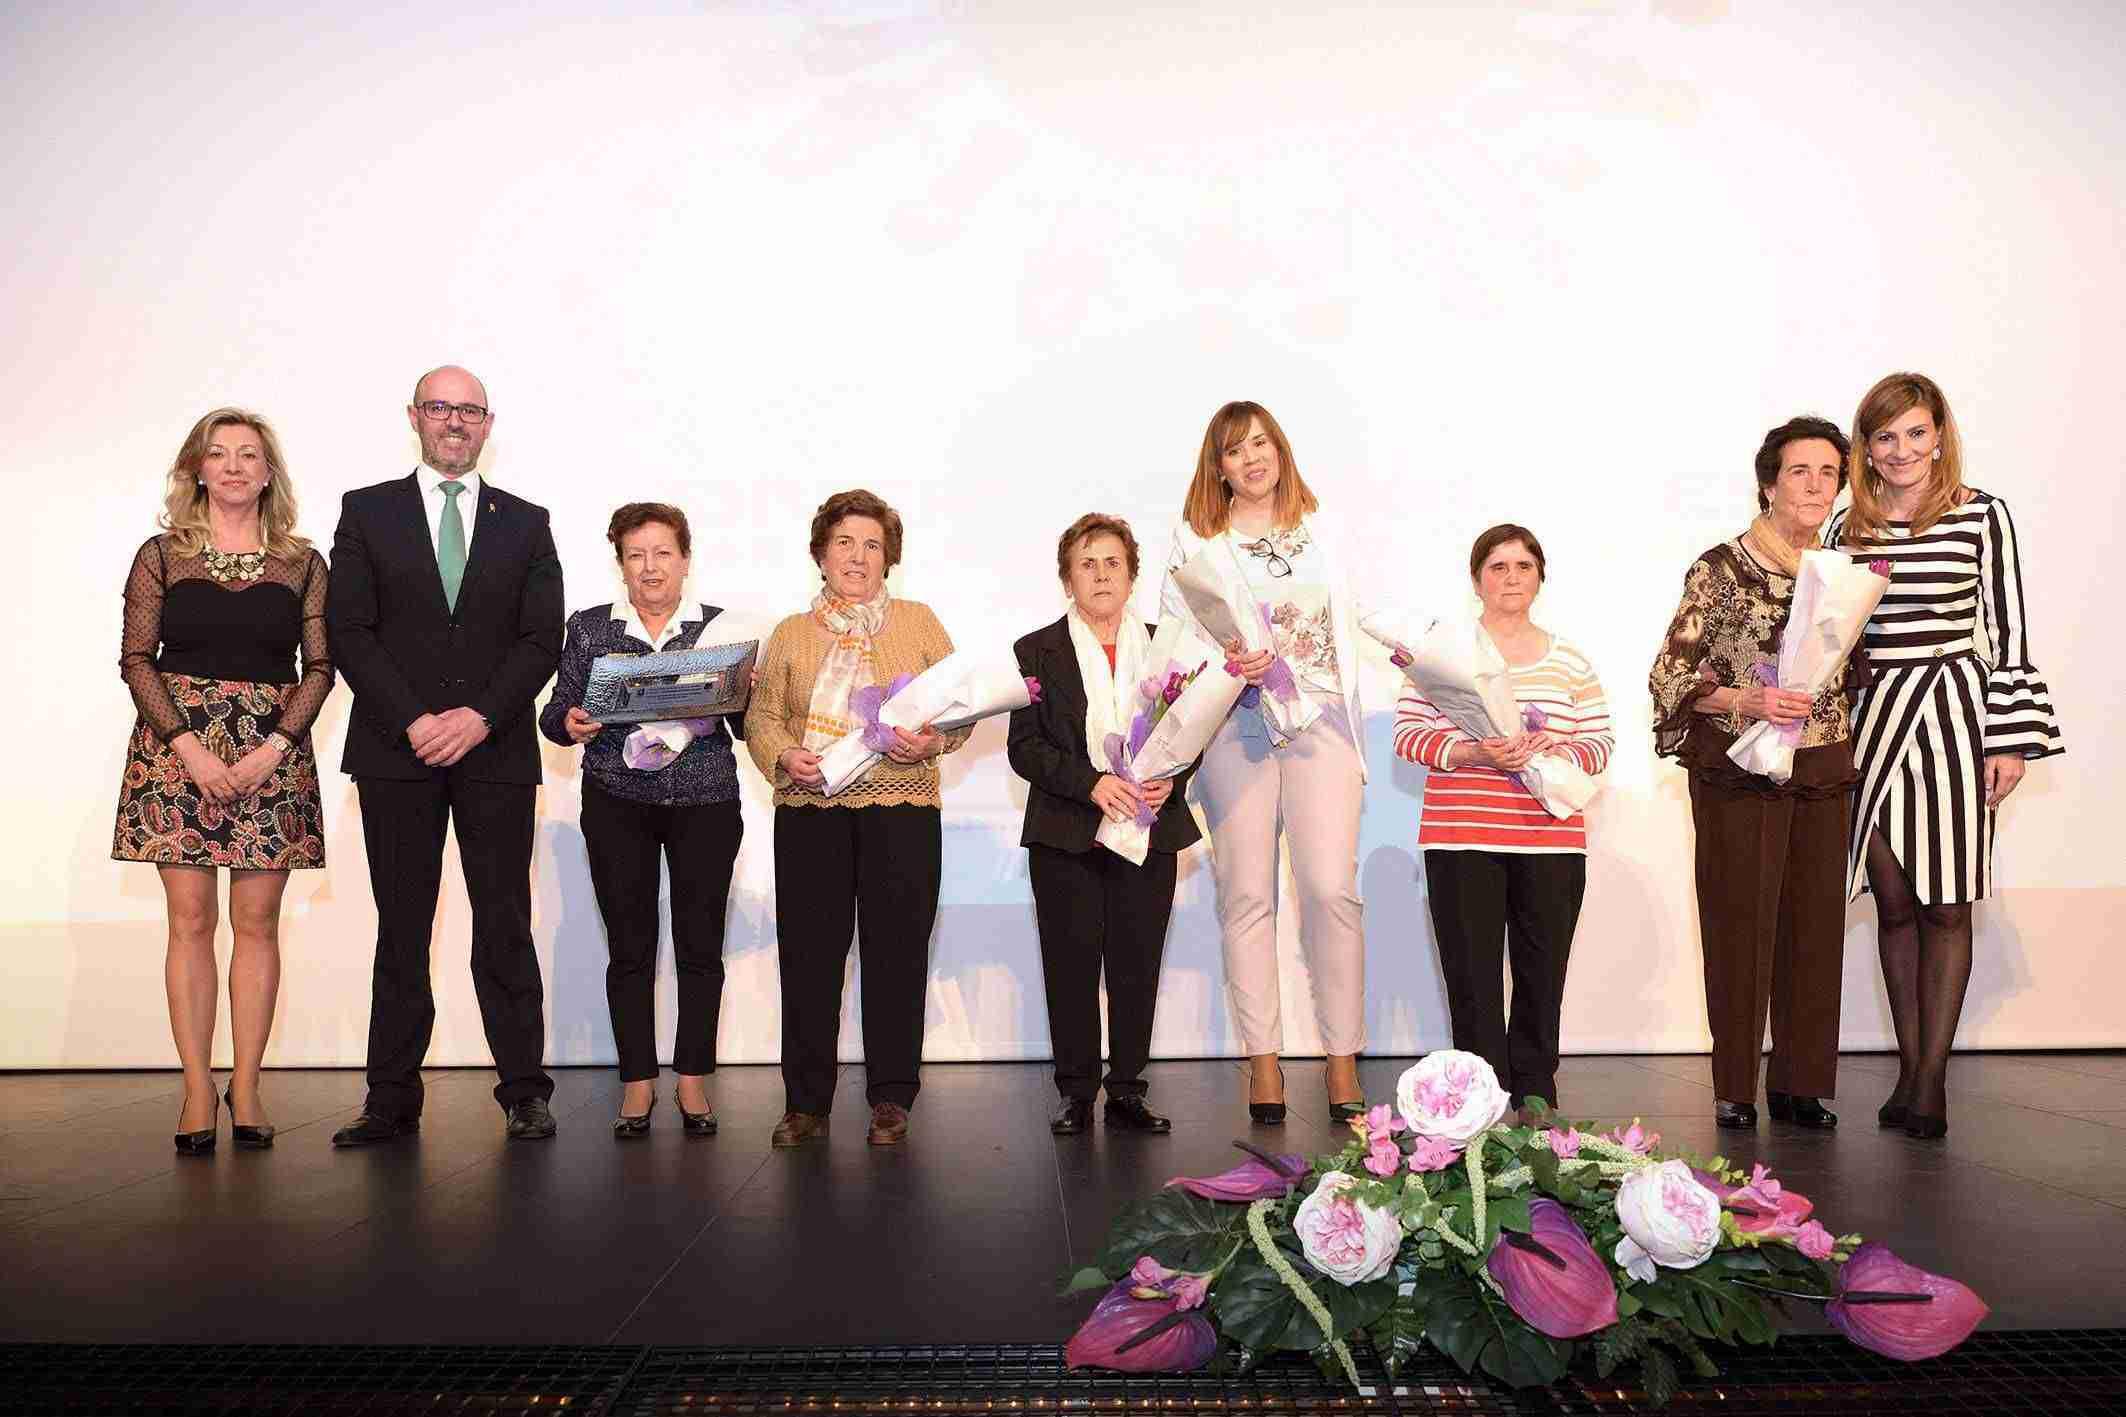 20180311_Acto Institu Dia Mujer_Solidaridad_AdeAlba 1